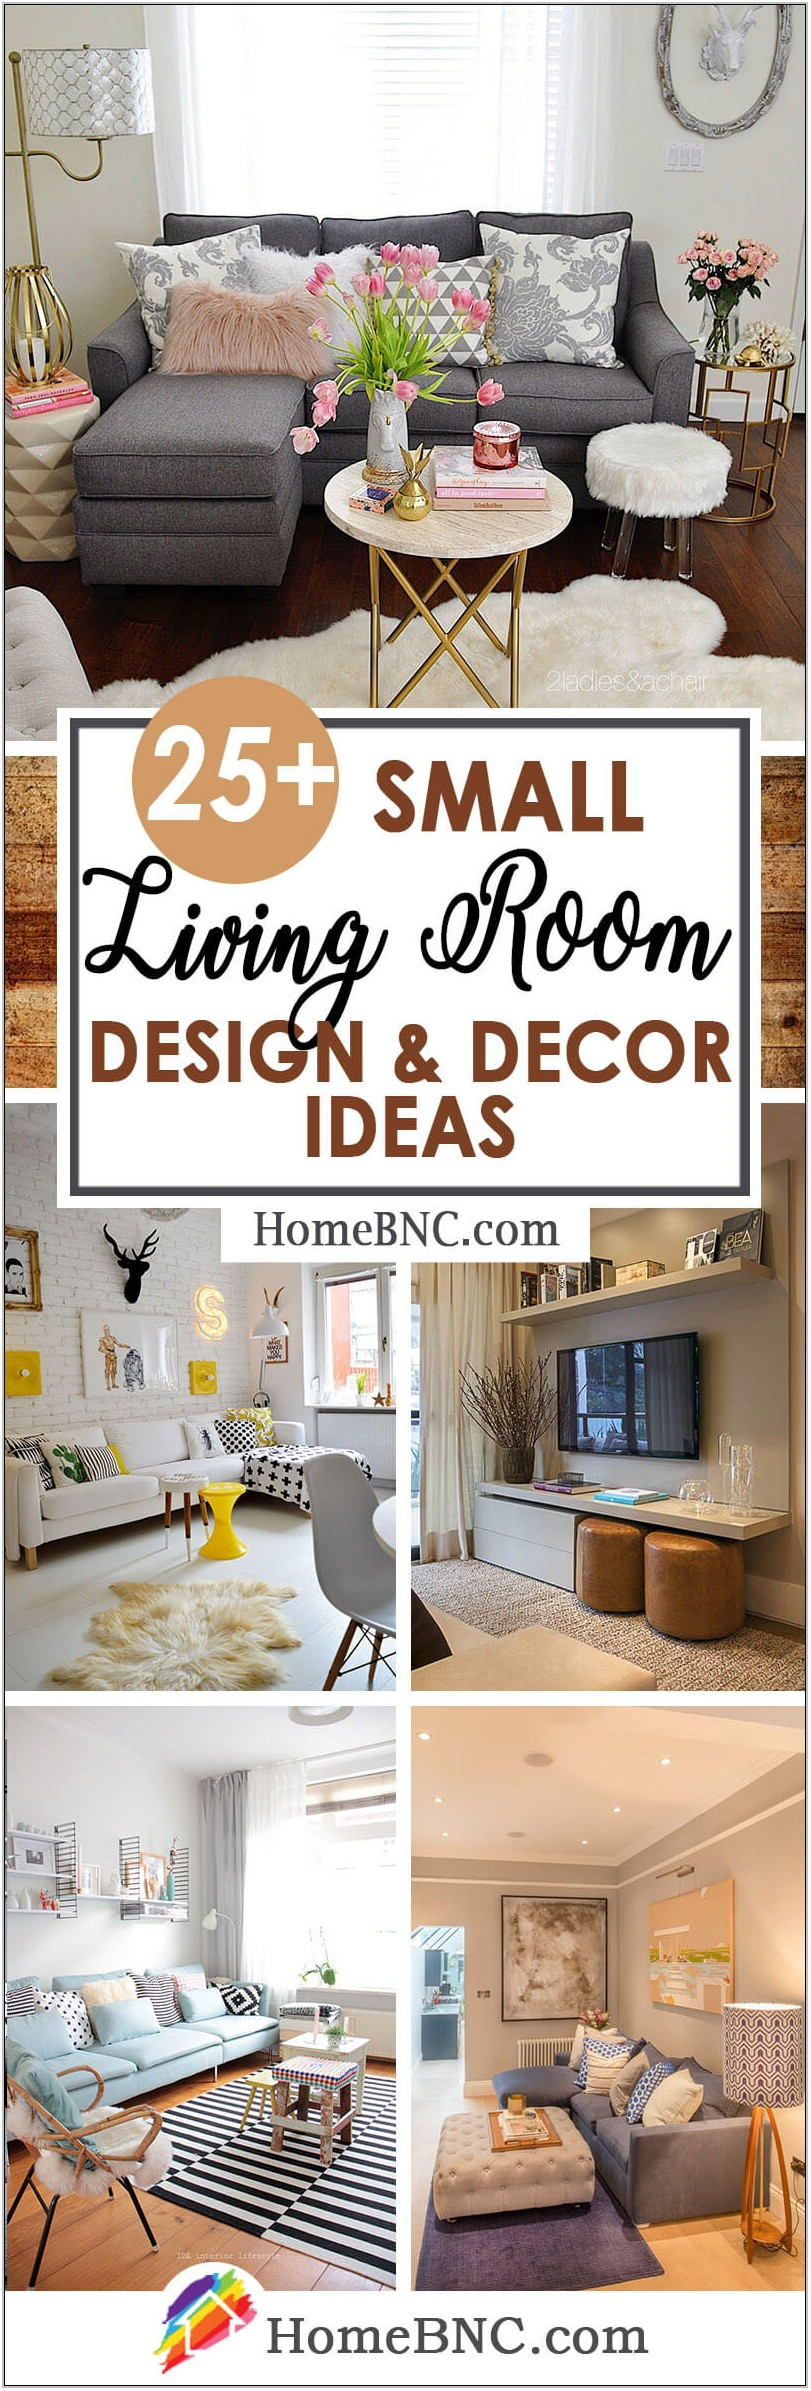 Small Living Room Ideas 2019